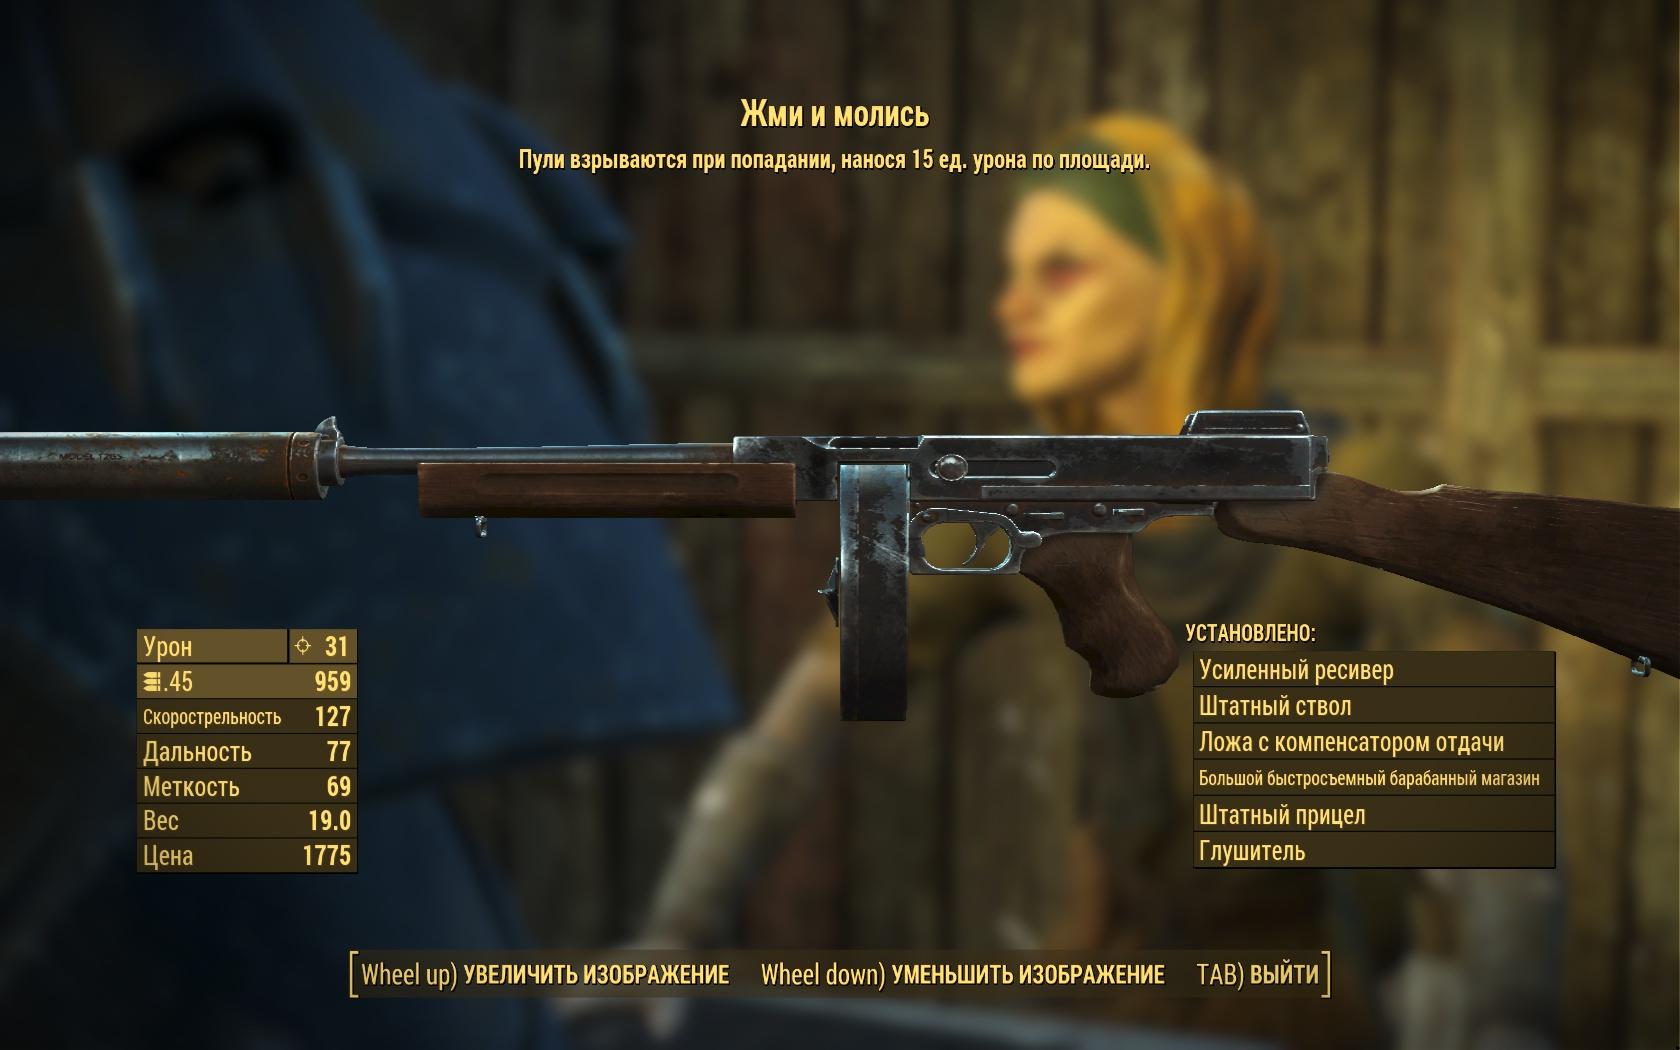 Жми и молись - Fallout 4 Жми и молись, Оружие